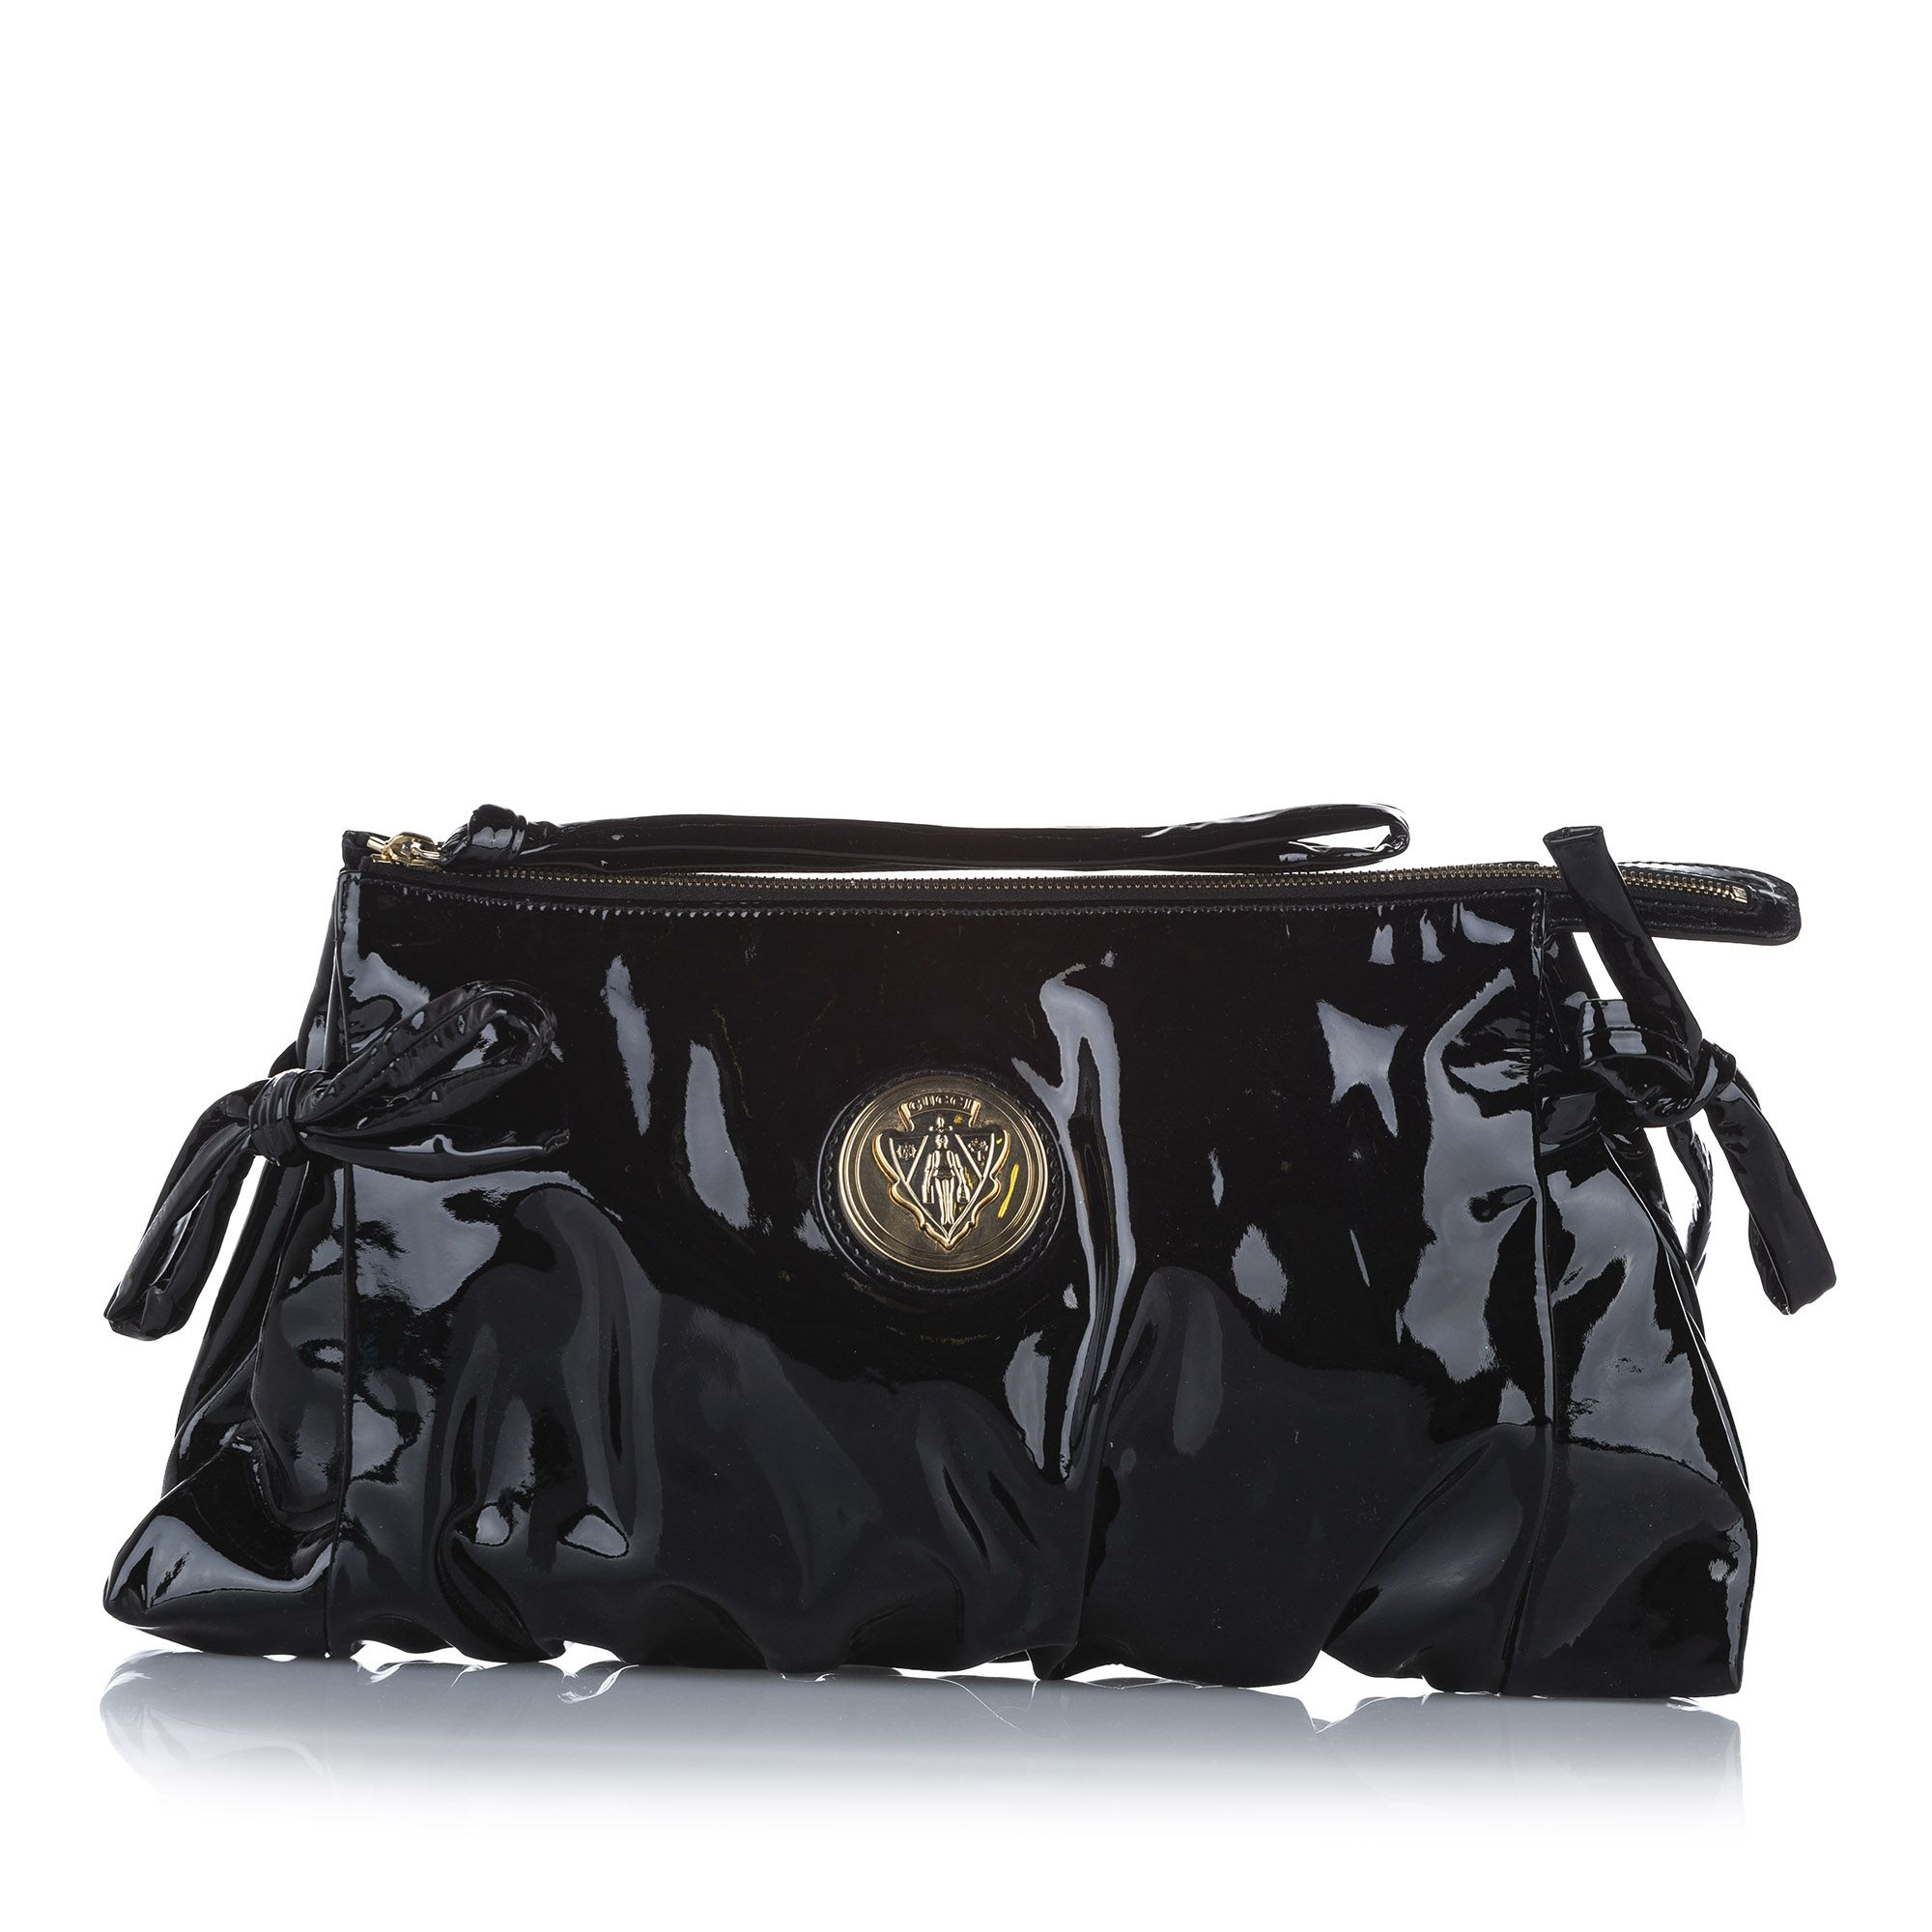 Vintage Gucci Hysteria Patent Leather Clutch Bag Black